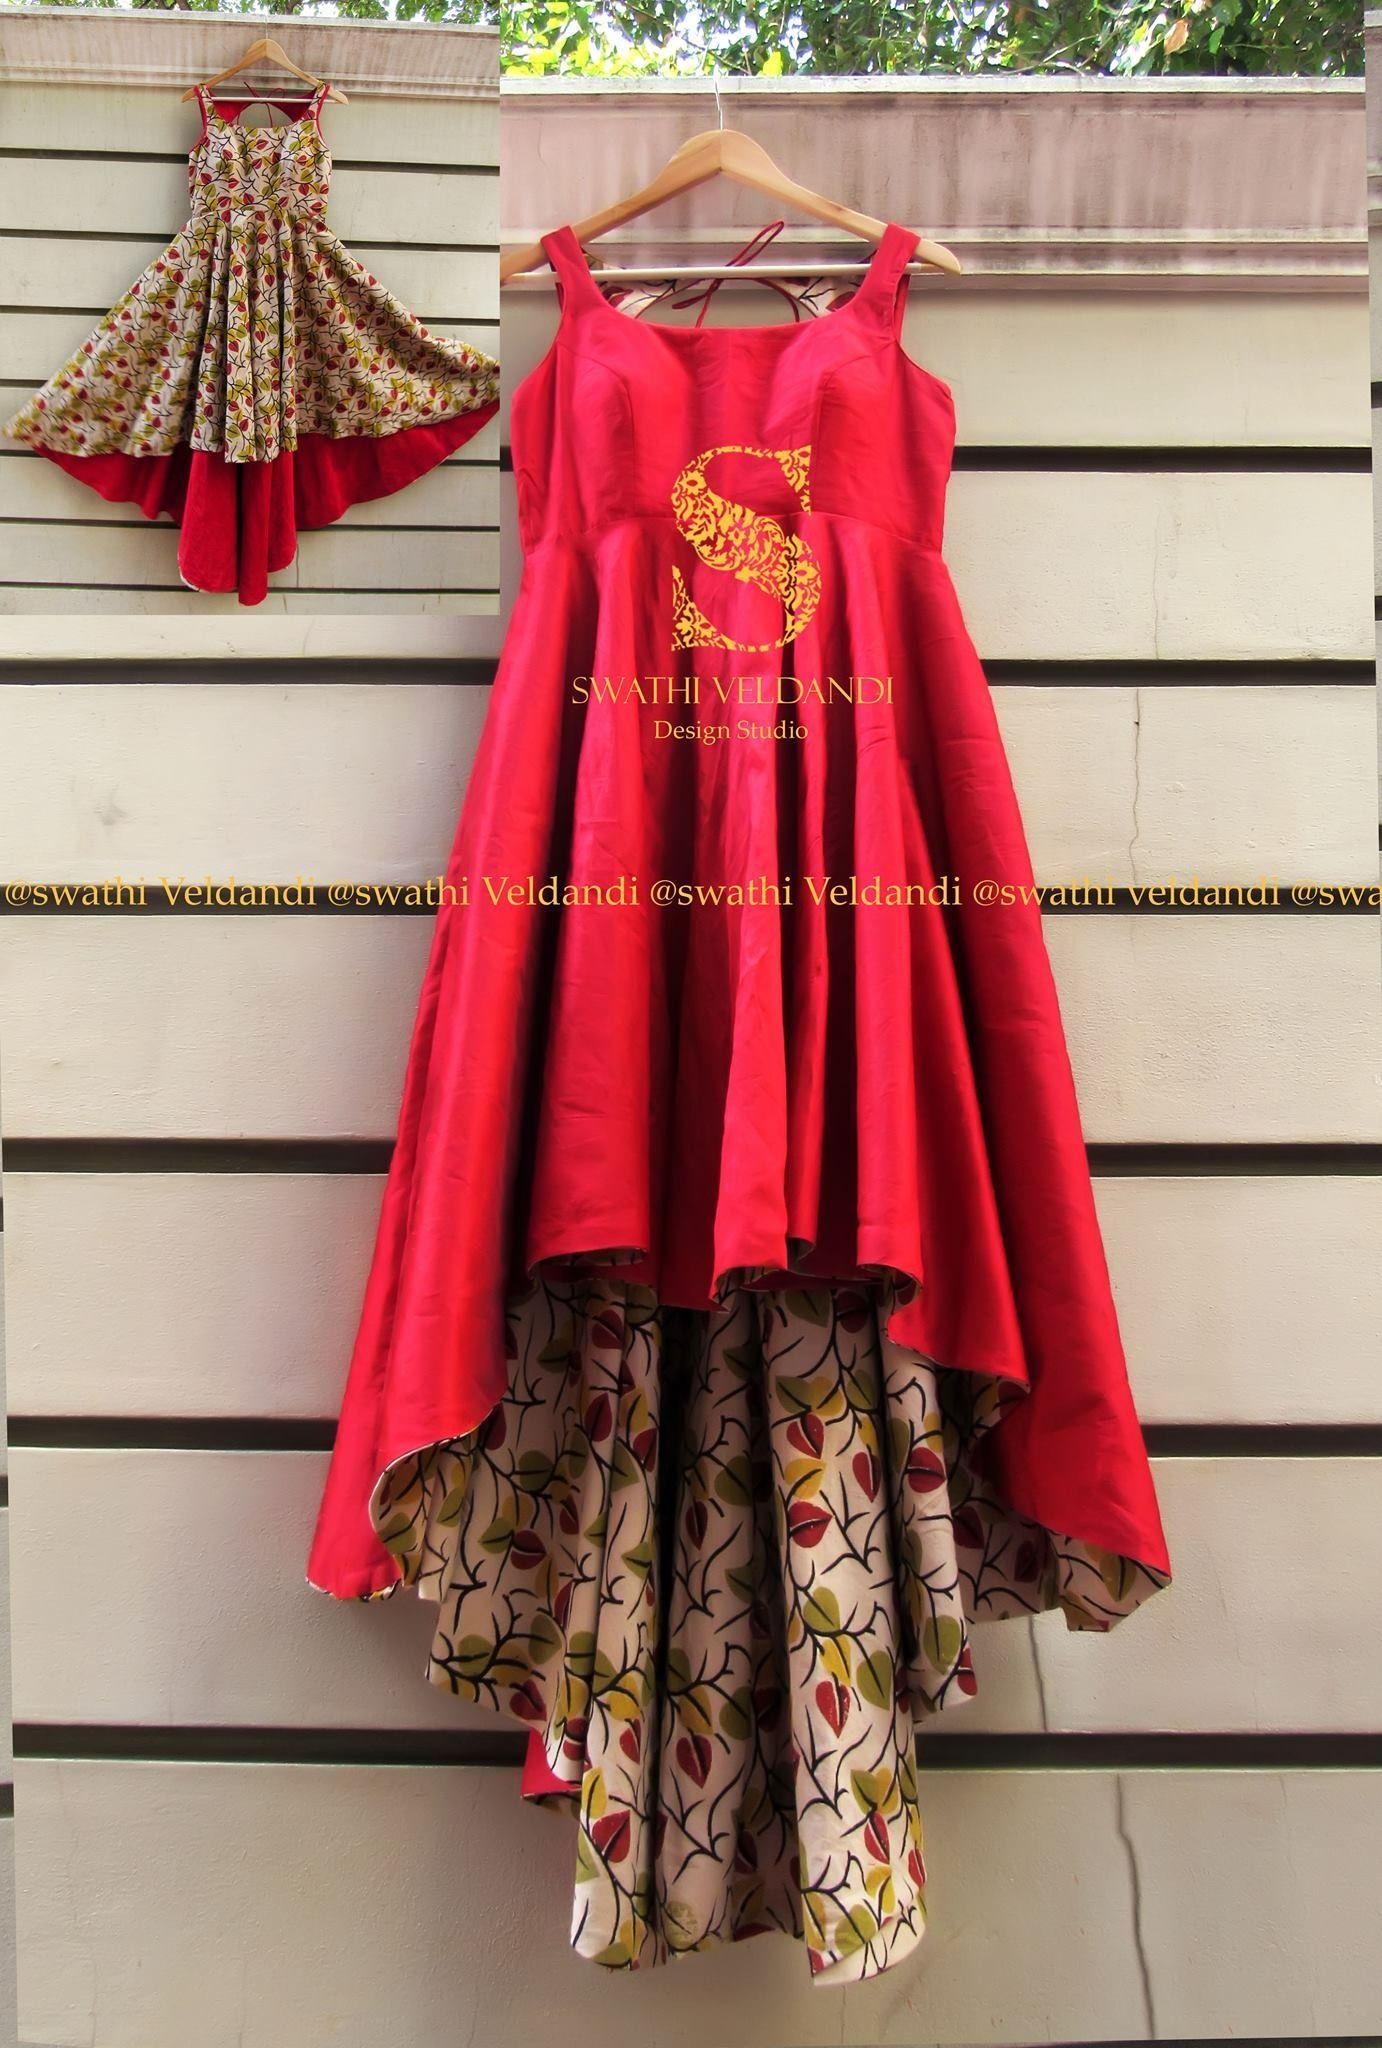 Pin de Mumtaz Razvi en polly | Pinterest | Moda india, India y Falda